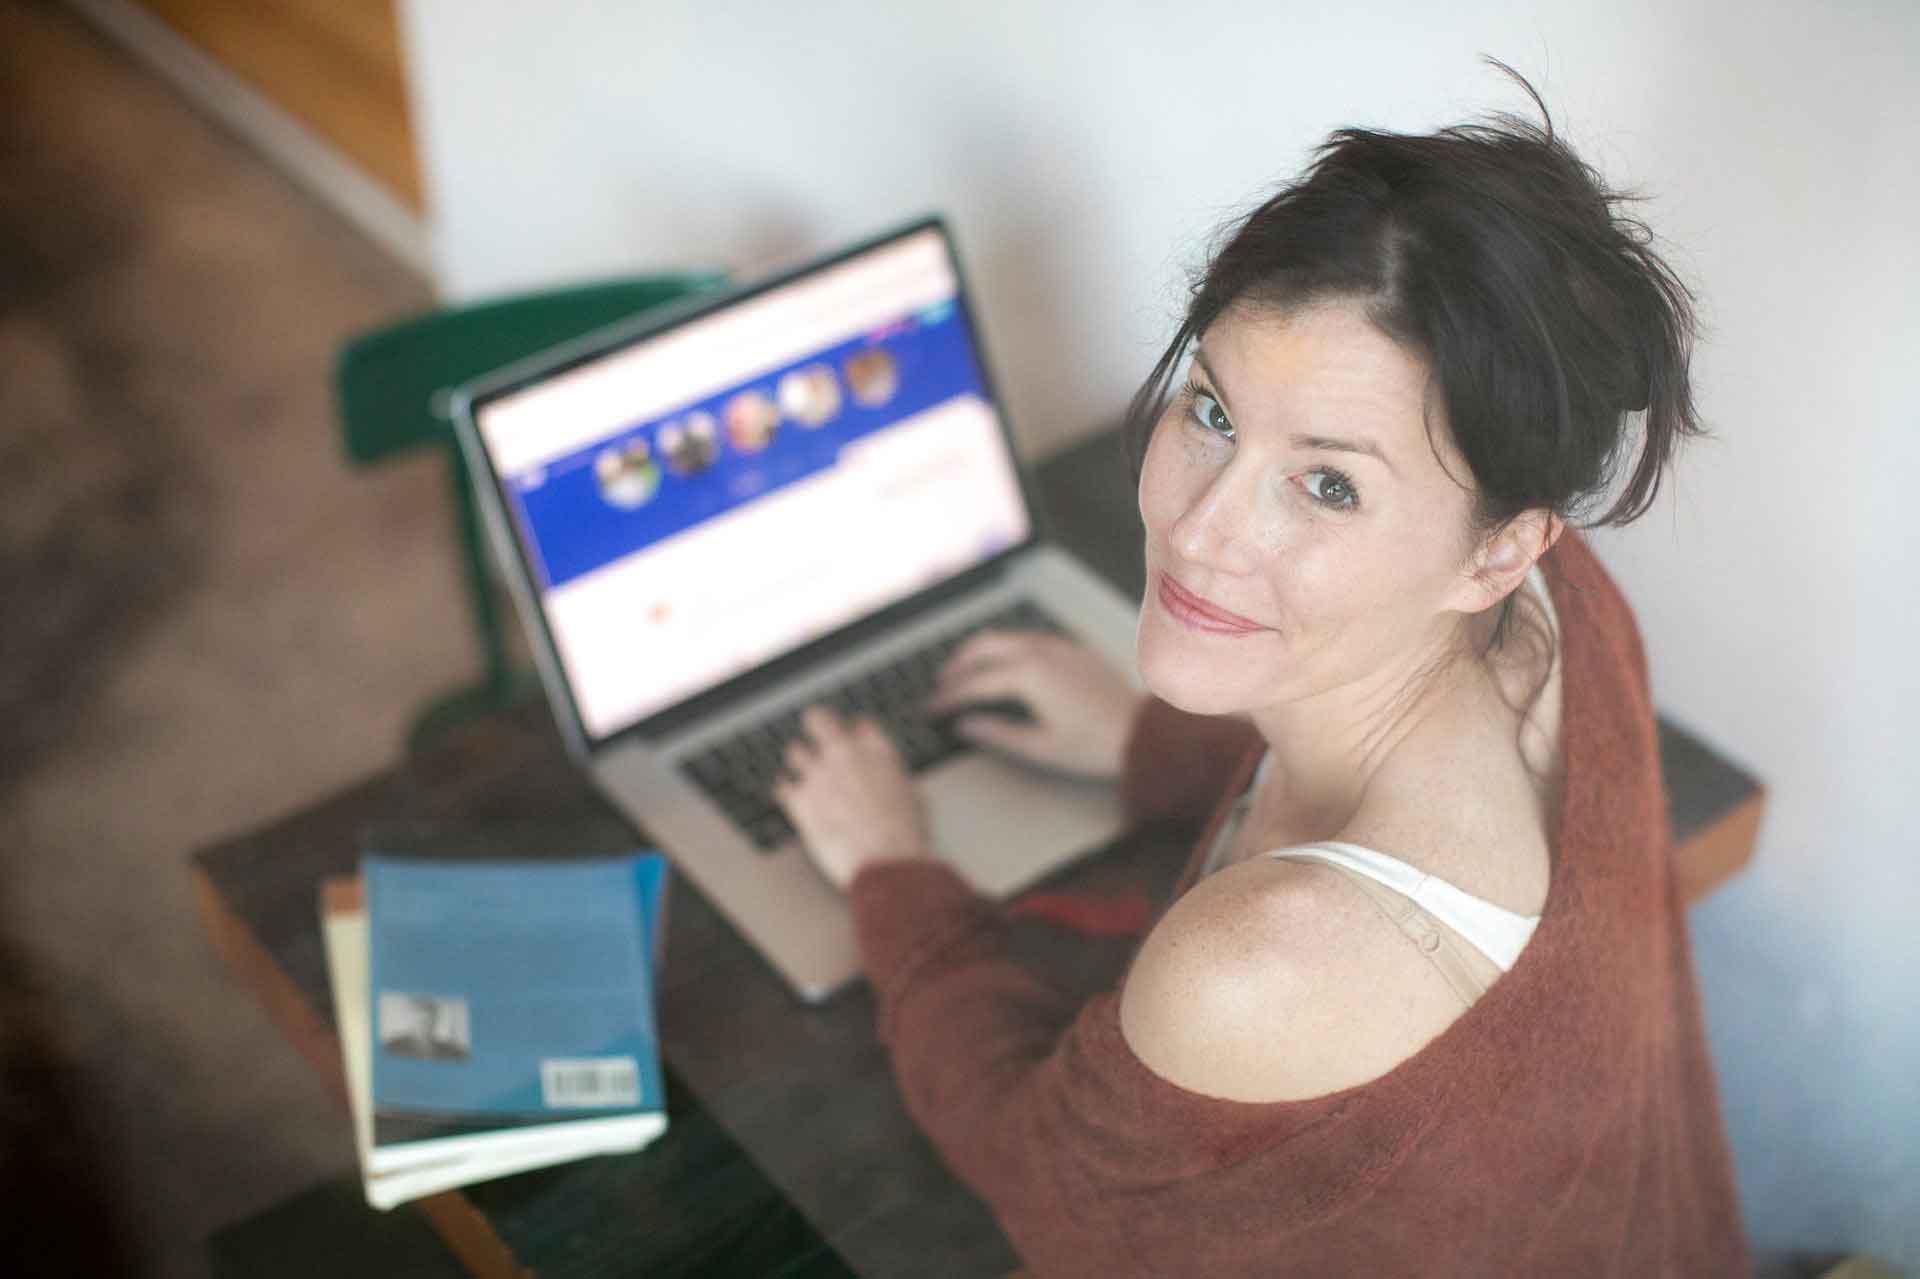 Frau erstellt ein Profil